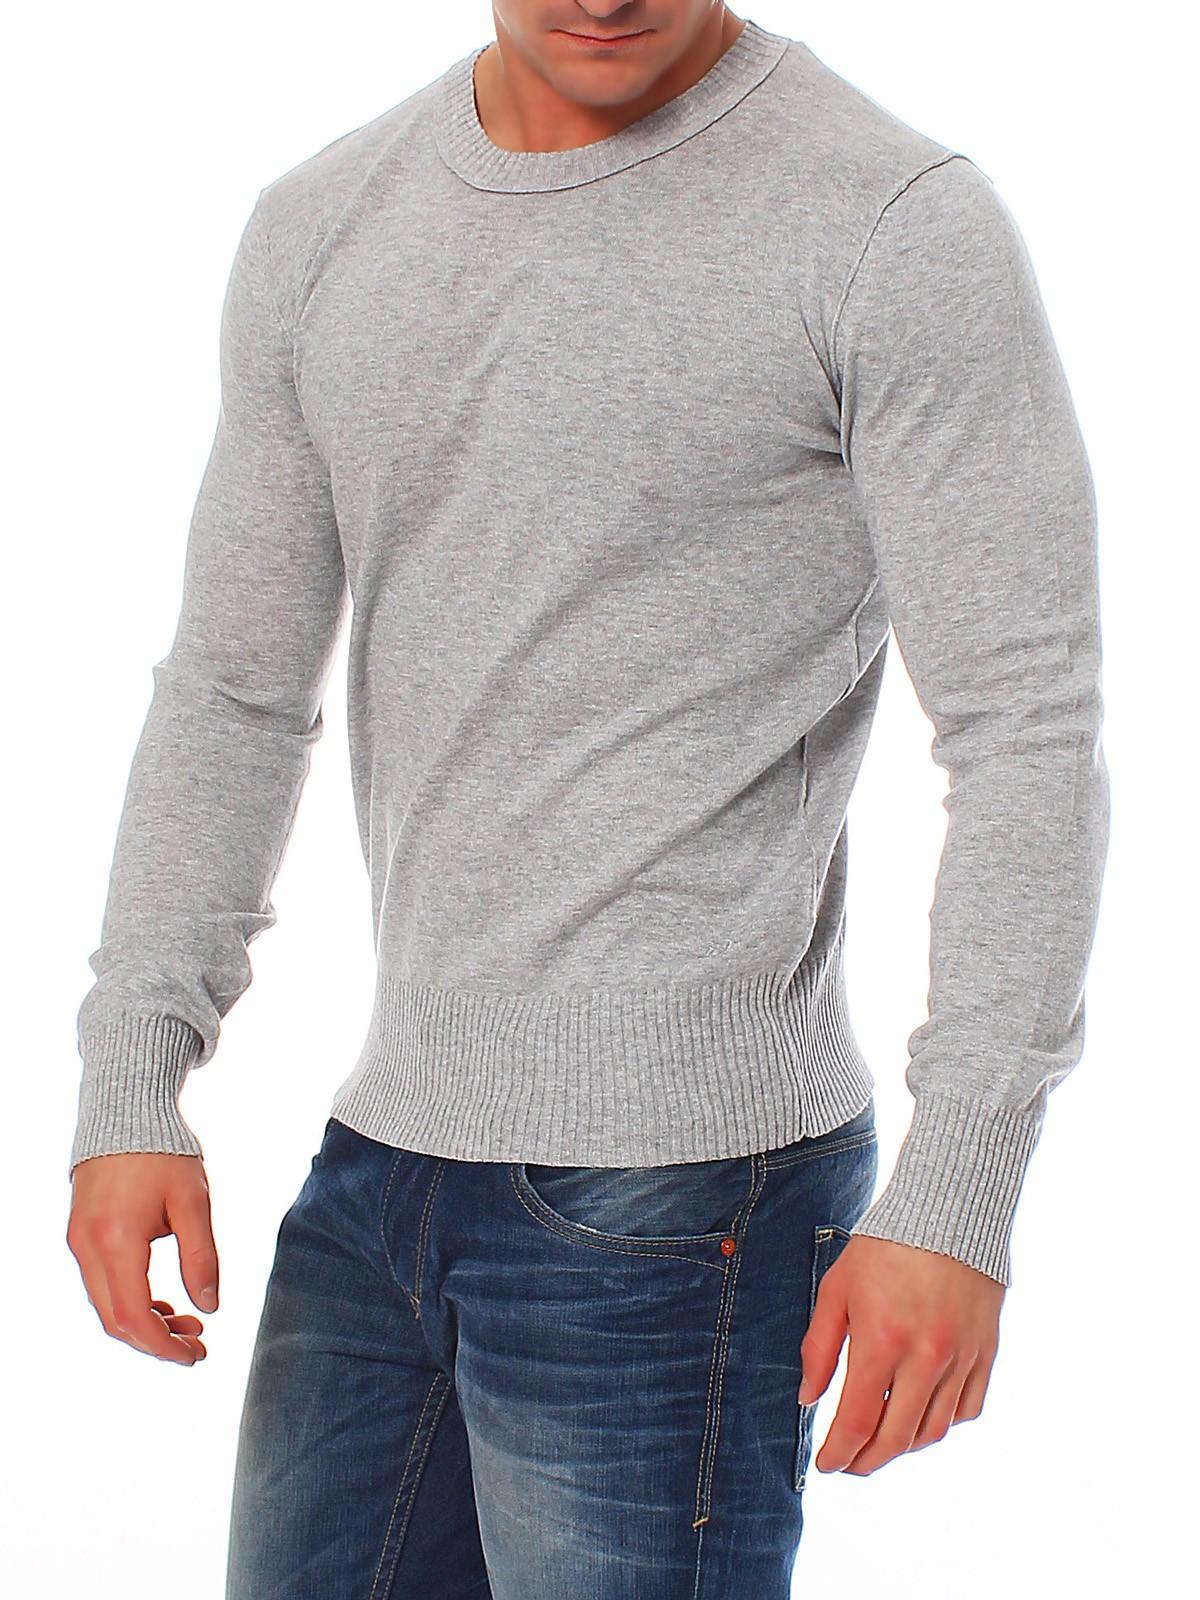 tom tailor herren pullover crew neck sweater 30111040912 grau herren pullover. Black Bedroom Furniture Sets. Home Design Ideas